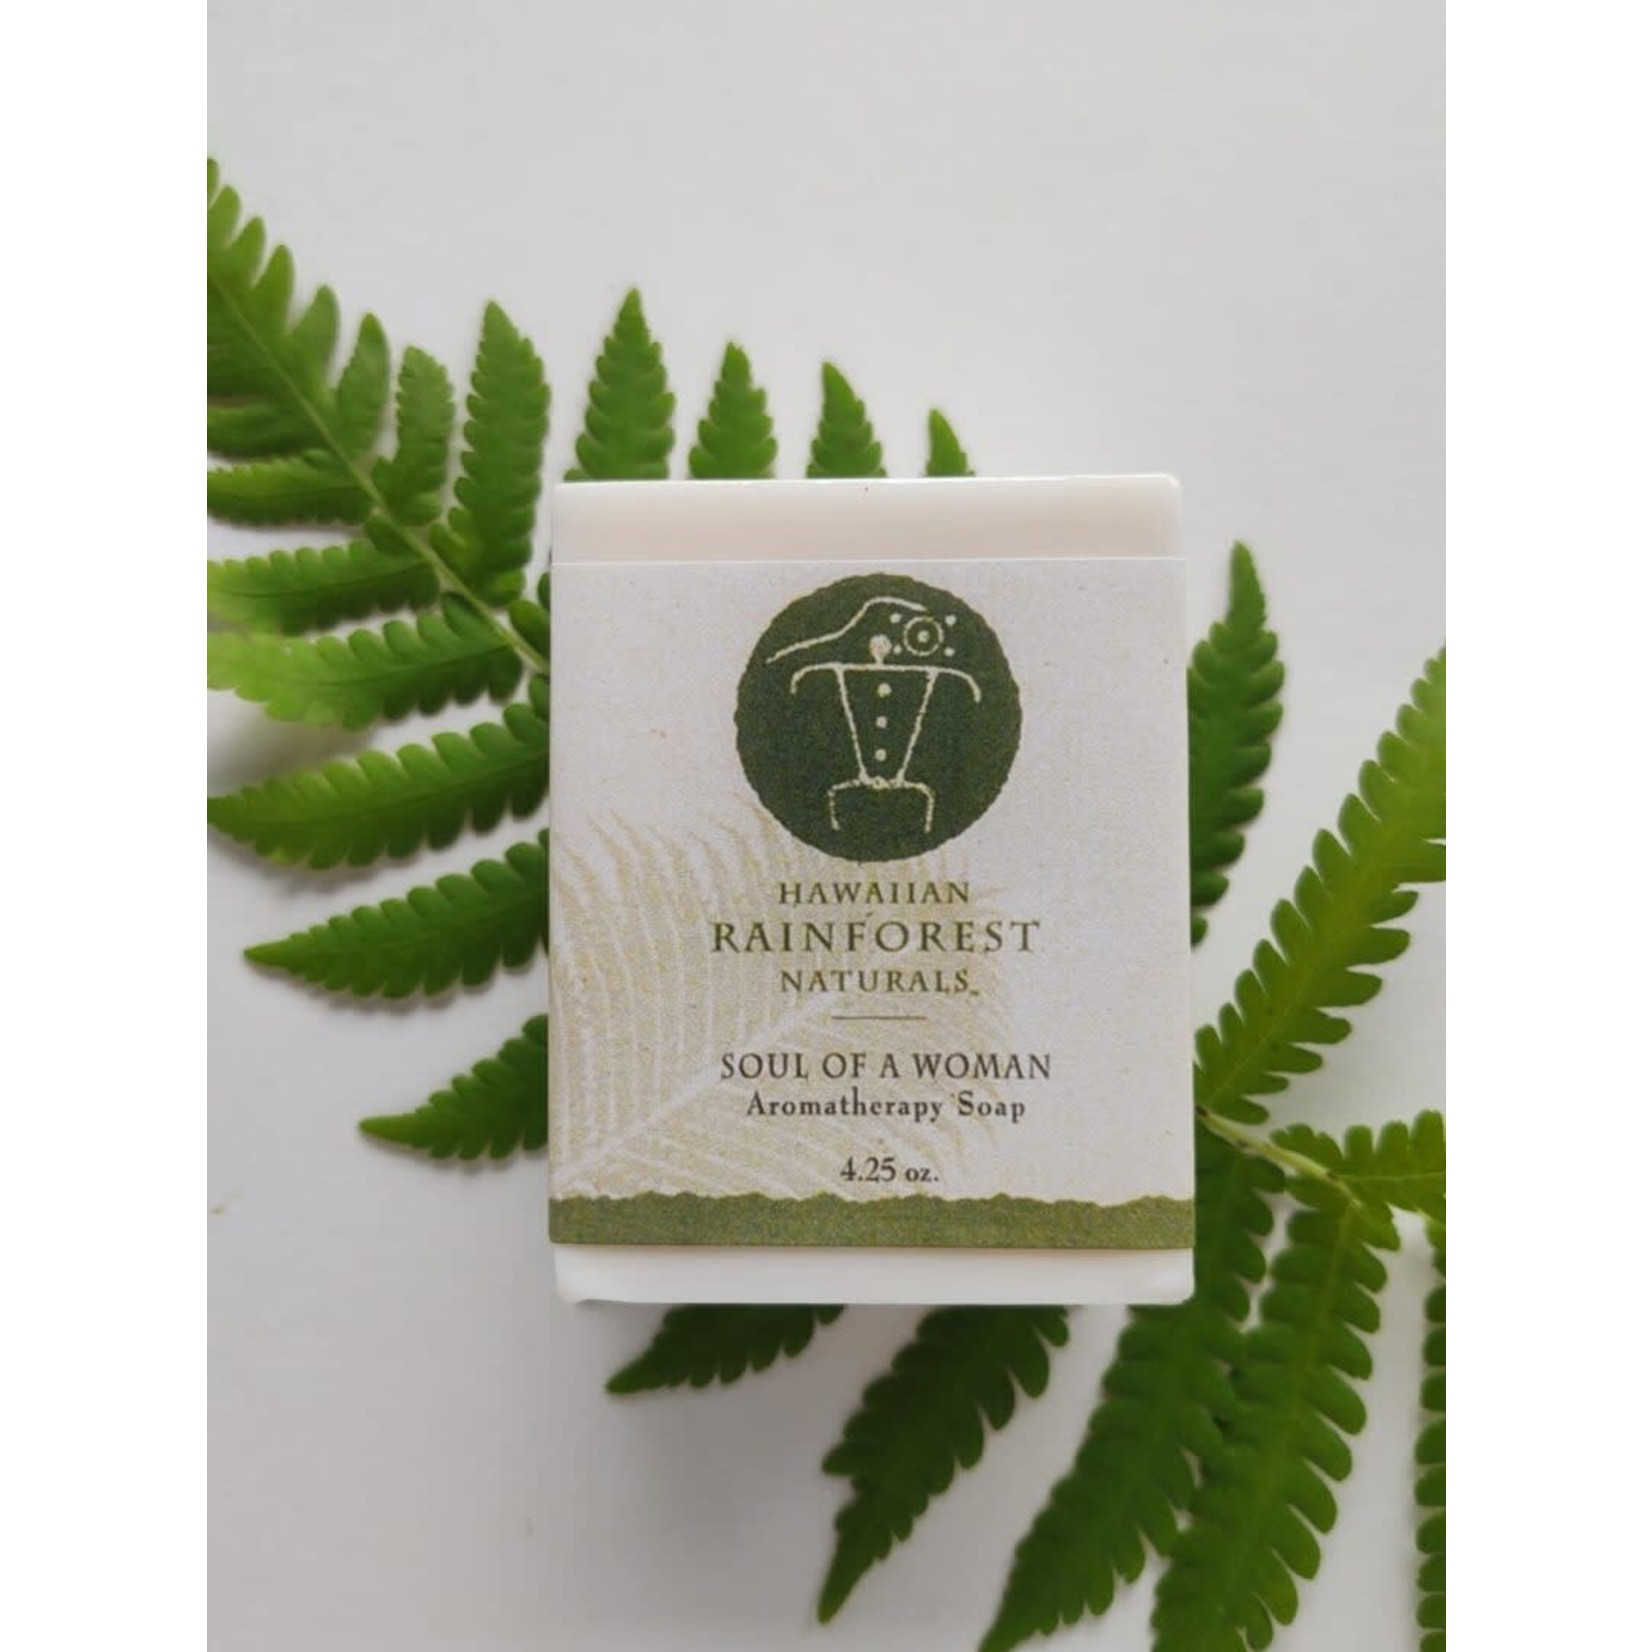 Hawaiian Rainforest Naturals Inc. Soul Of A Woman Aromatherapy Soap